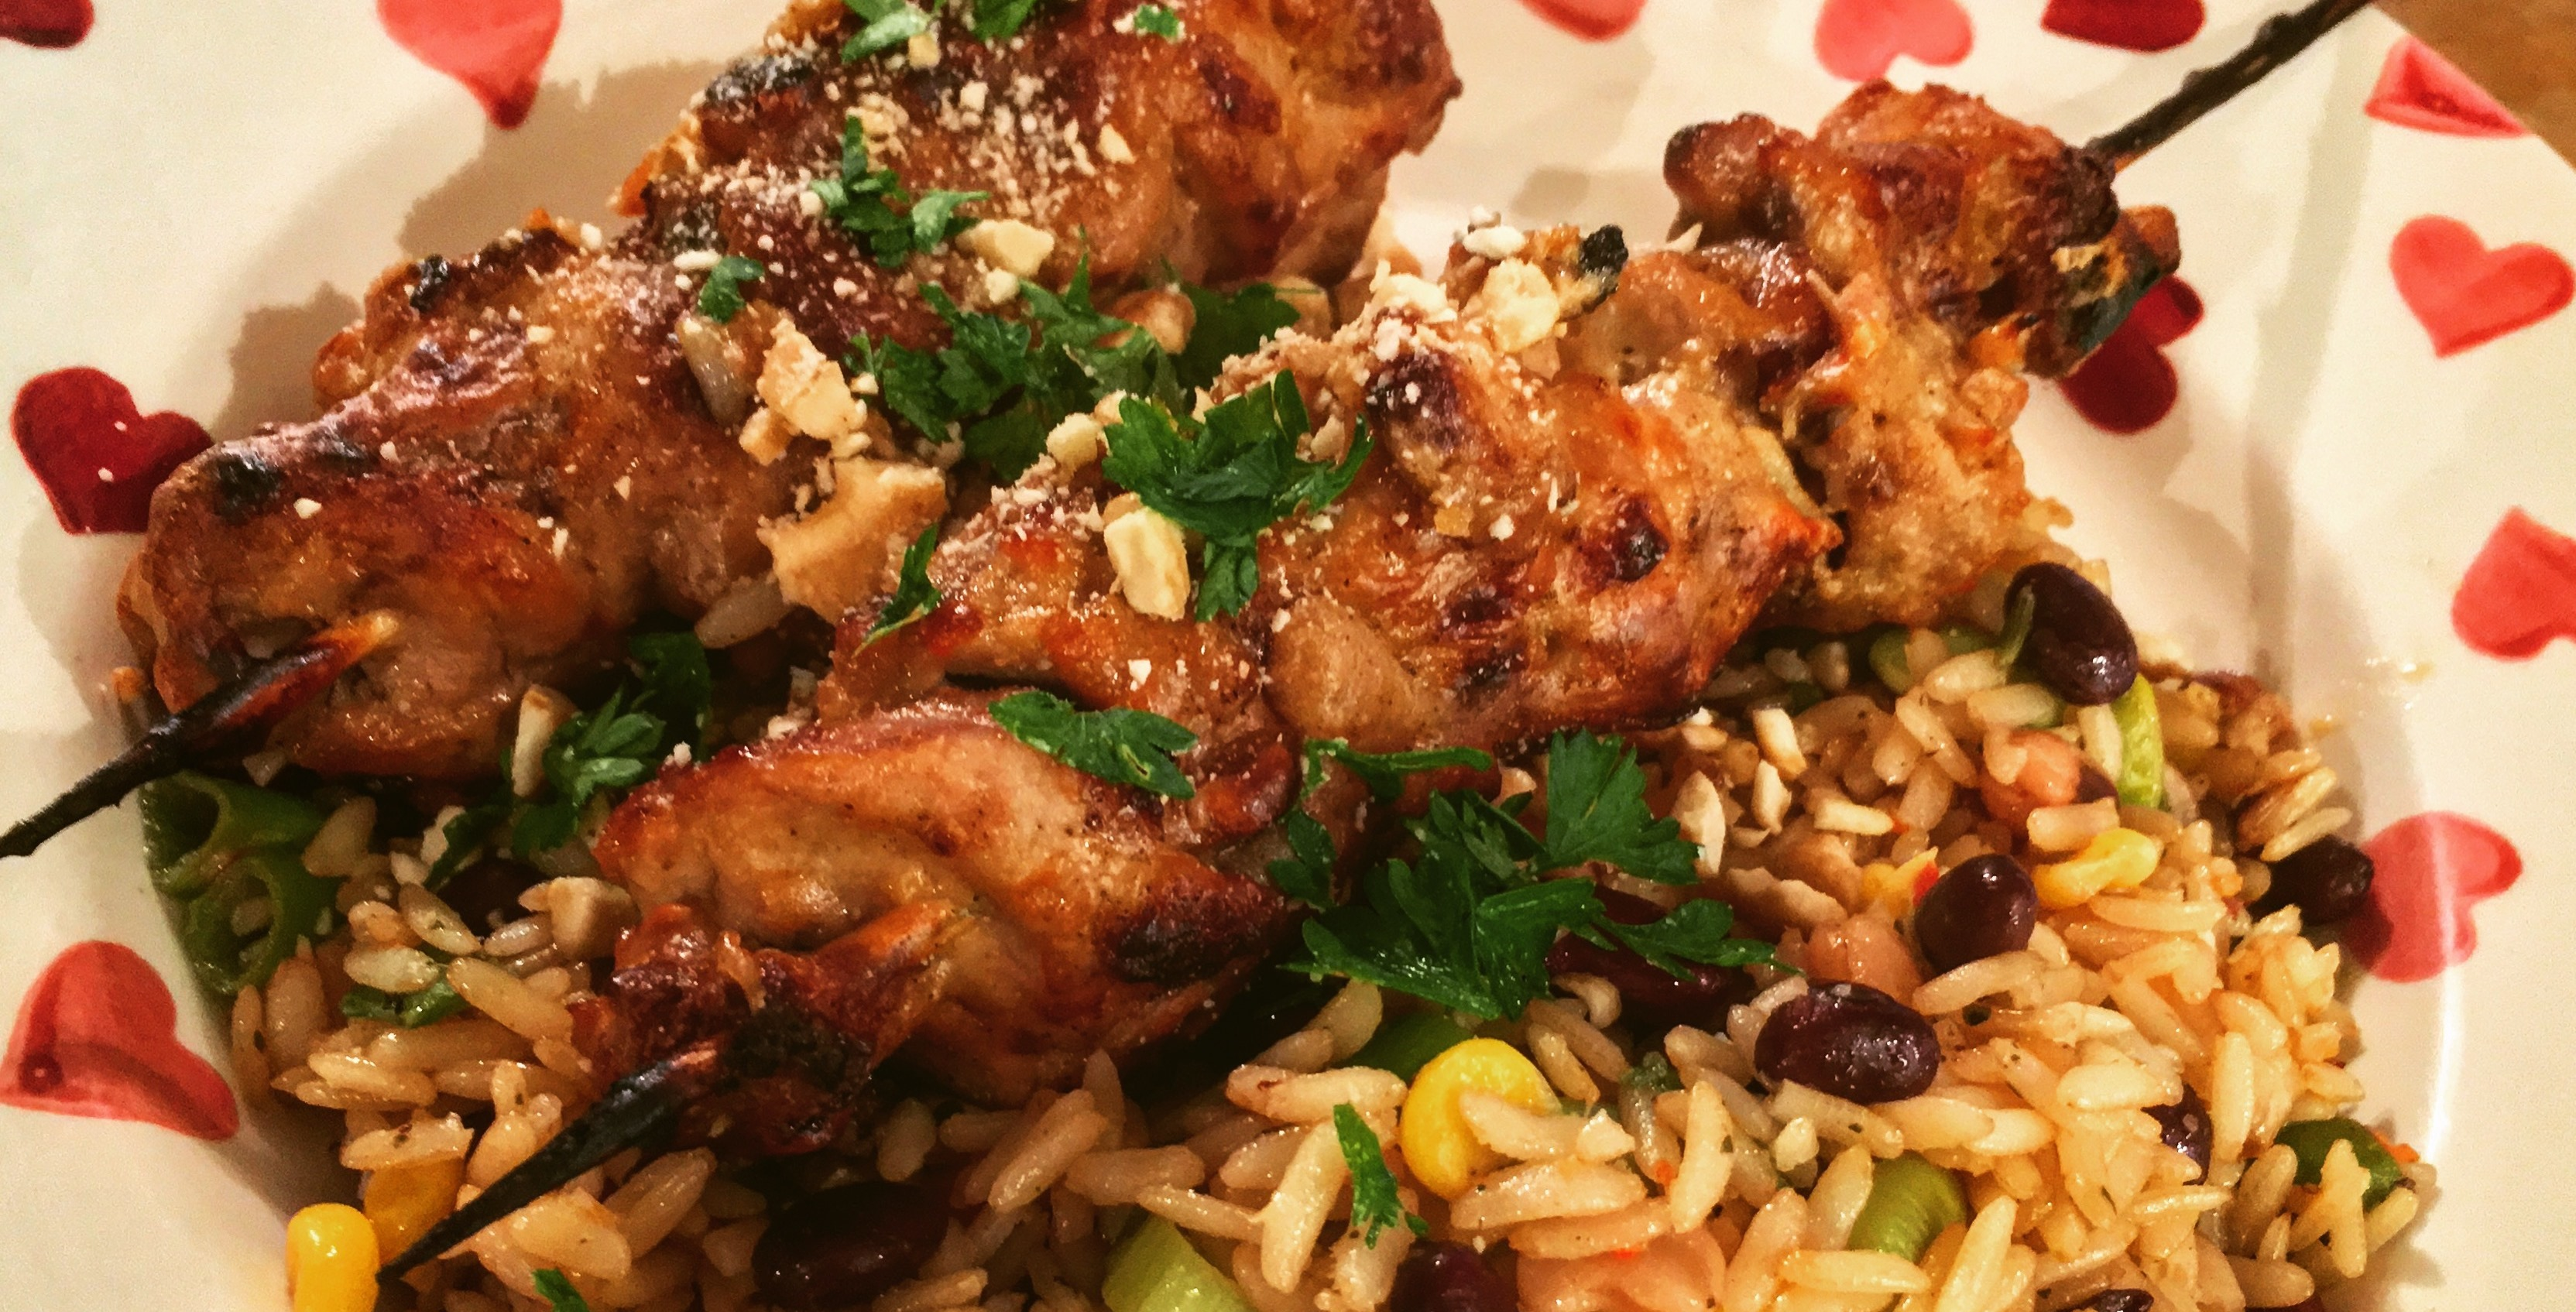 Browning blog - Recipe: Pheasant satay skewers